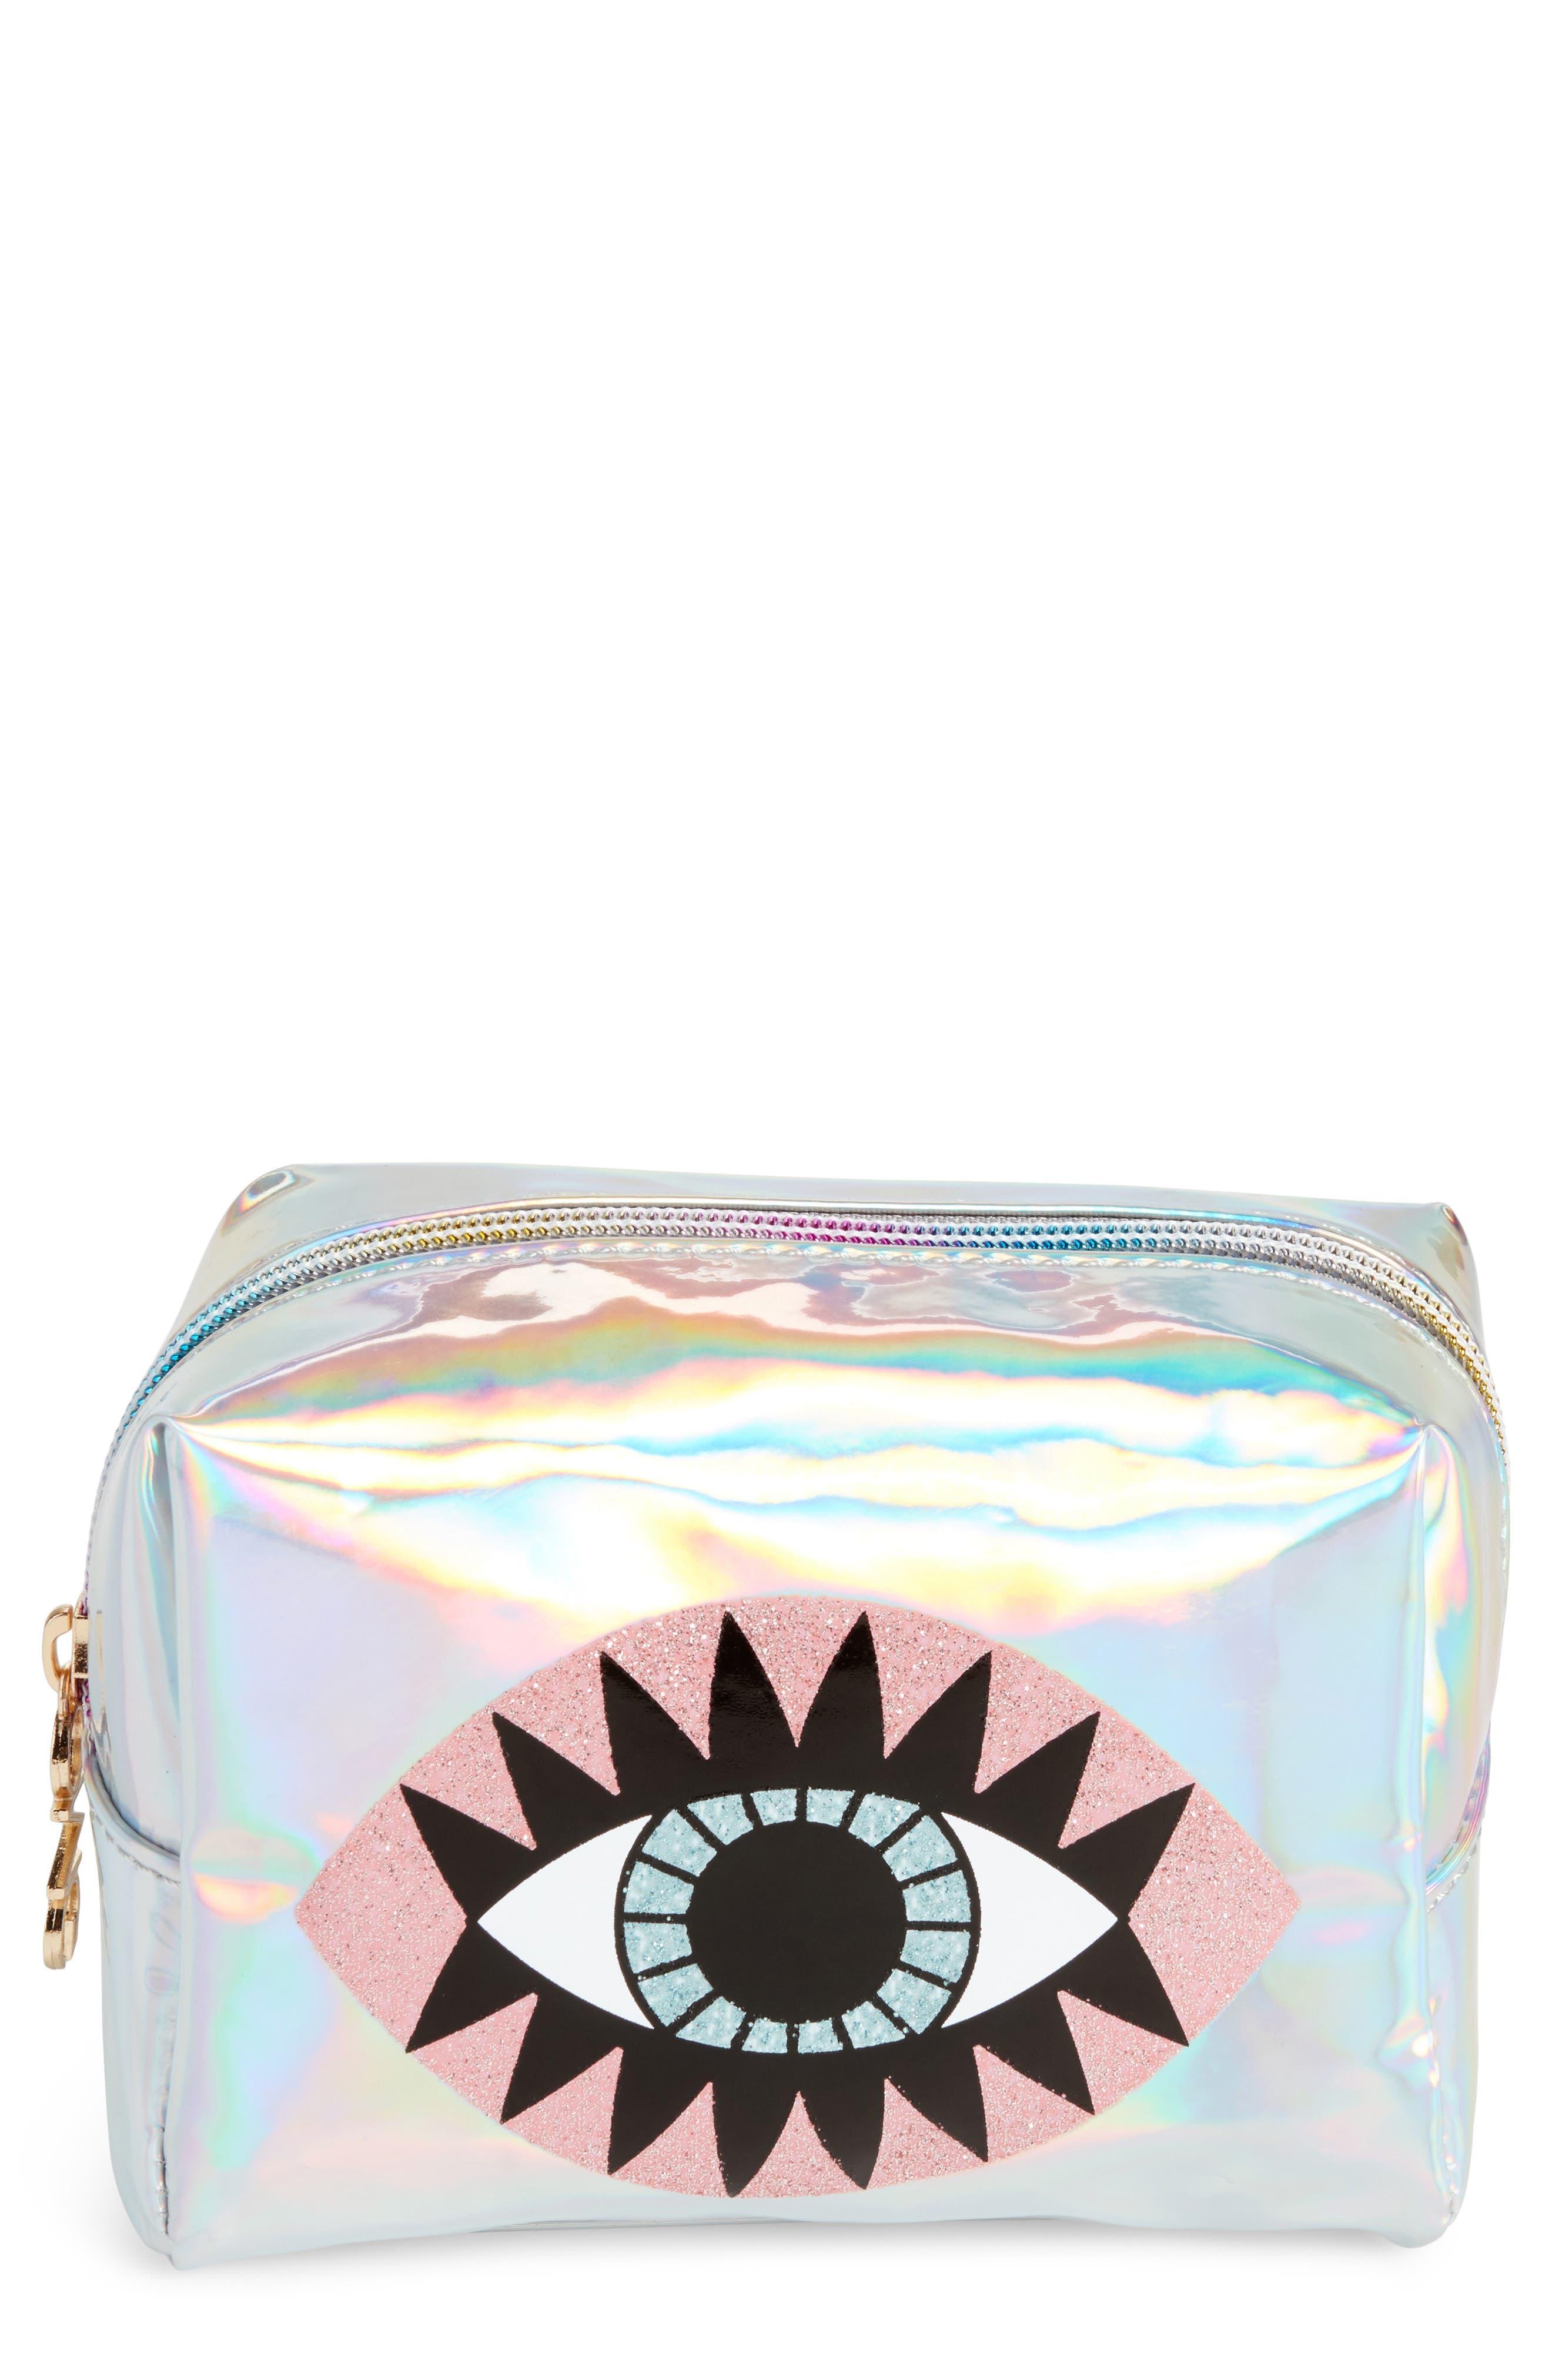 Main Image - OMG Glitter Eye Iridescent Cosmetics Bag